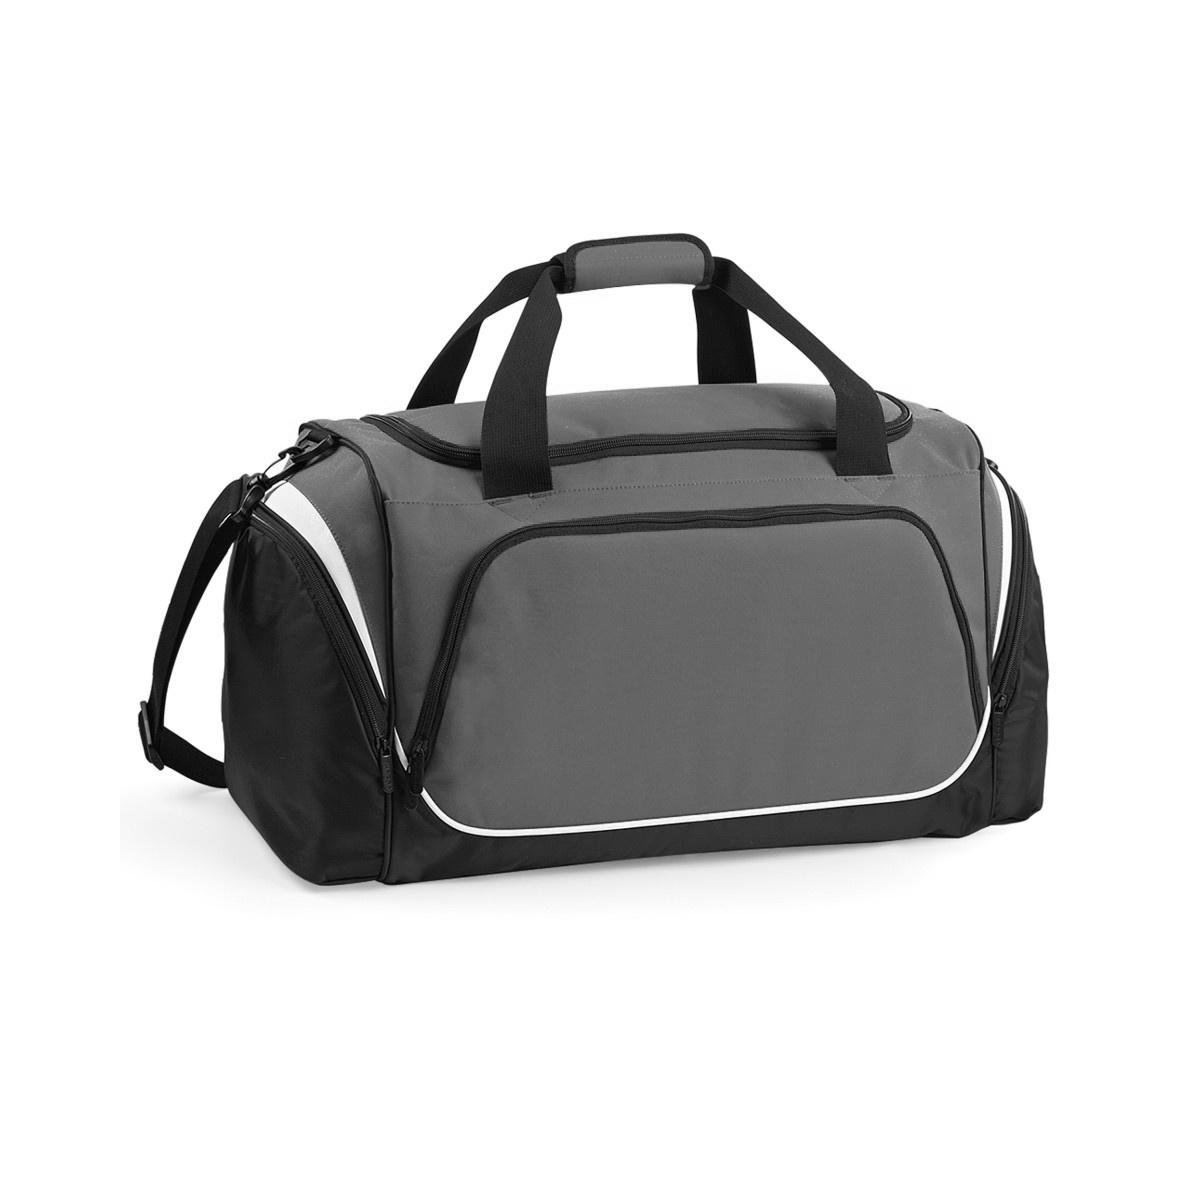 Quadra Pro Team Holdall / Duffle Bag (55 Litres) (One Size) (Graphite/Black/White)